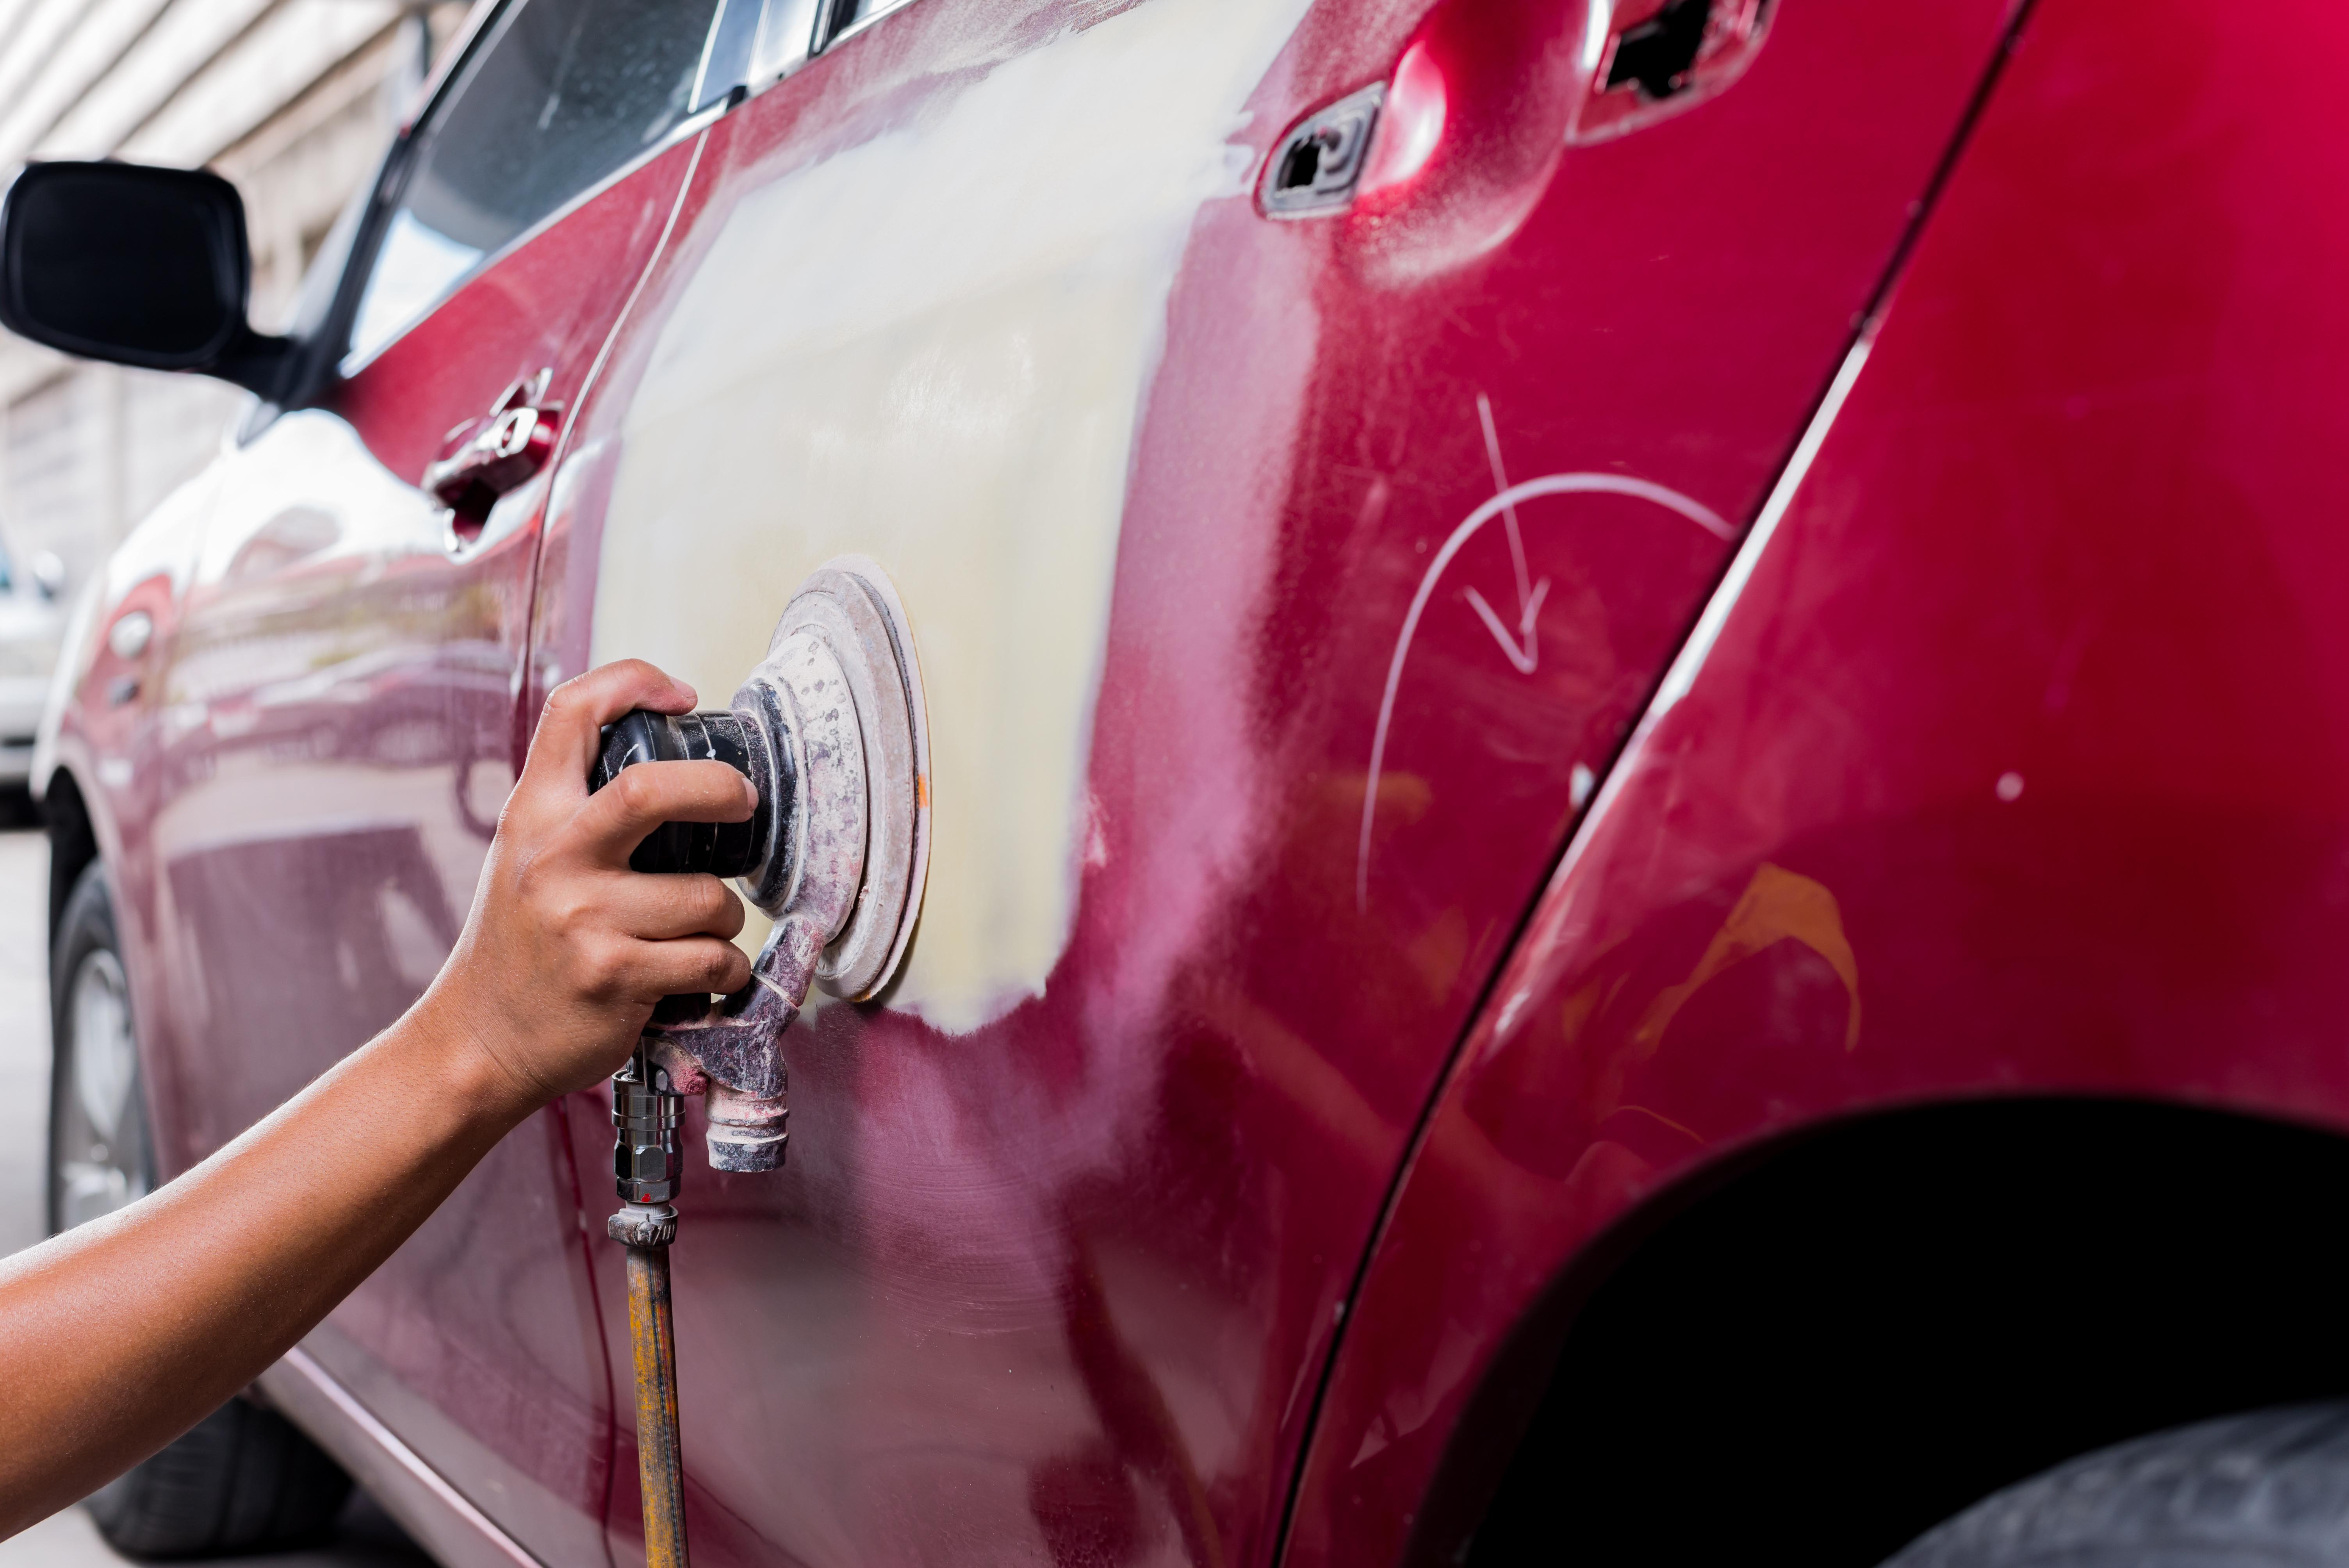 Paint and Collsion Repair